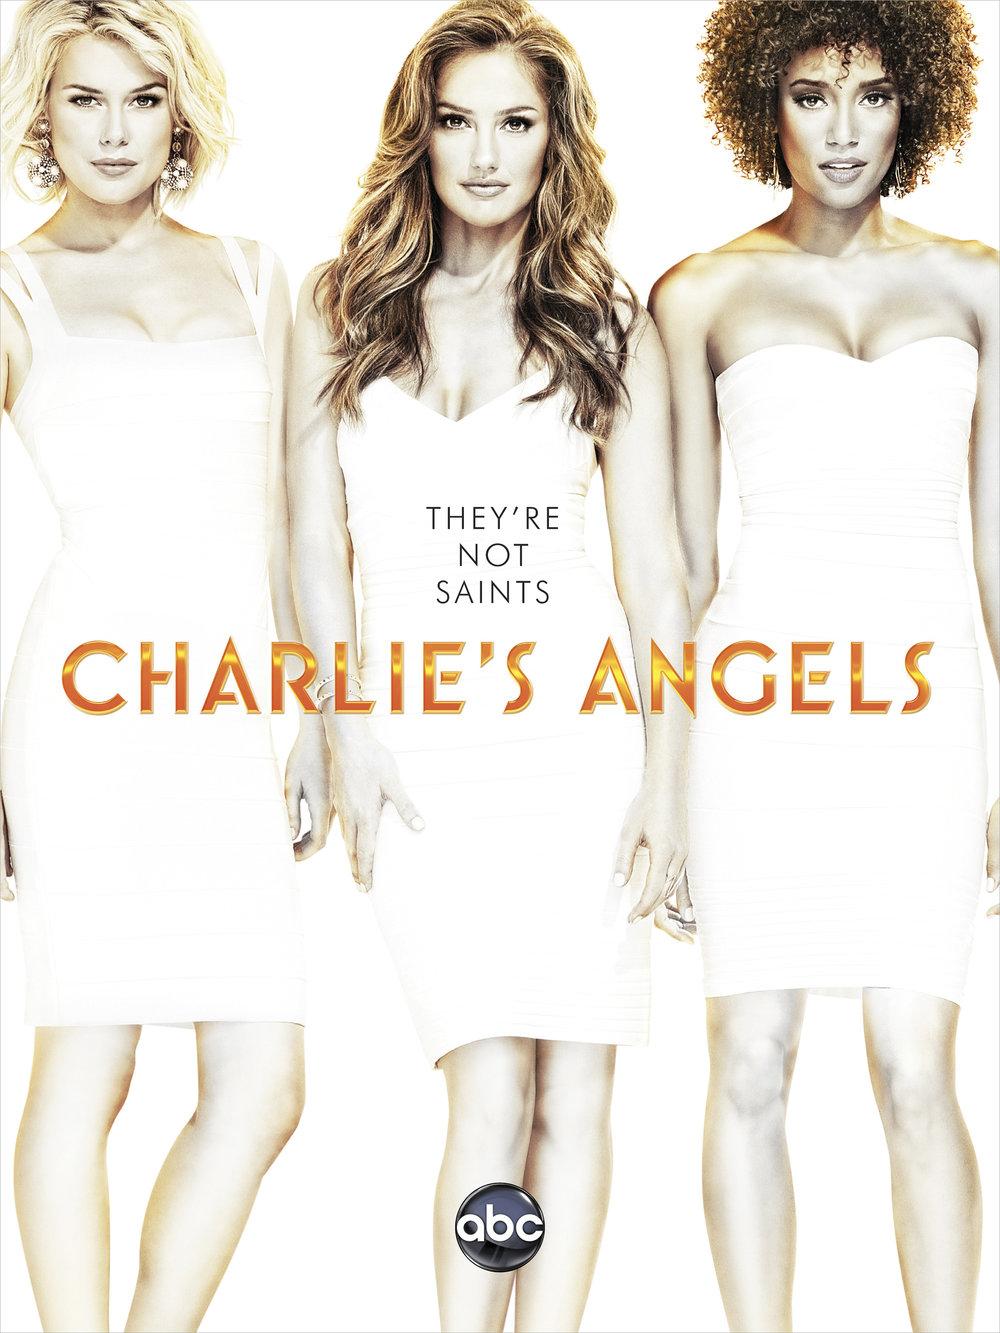 charliesangels2.jpg